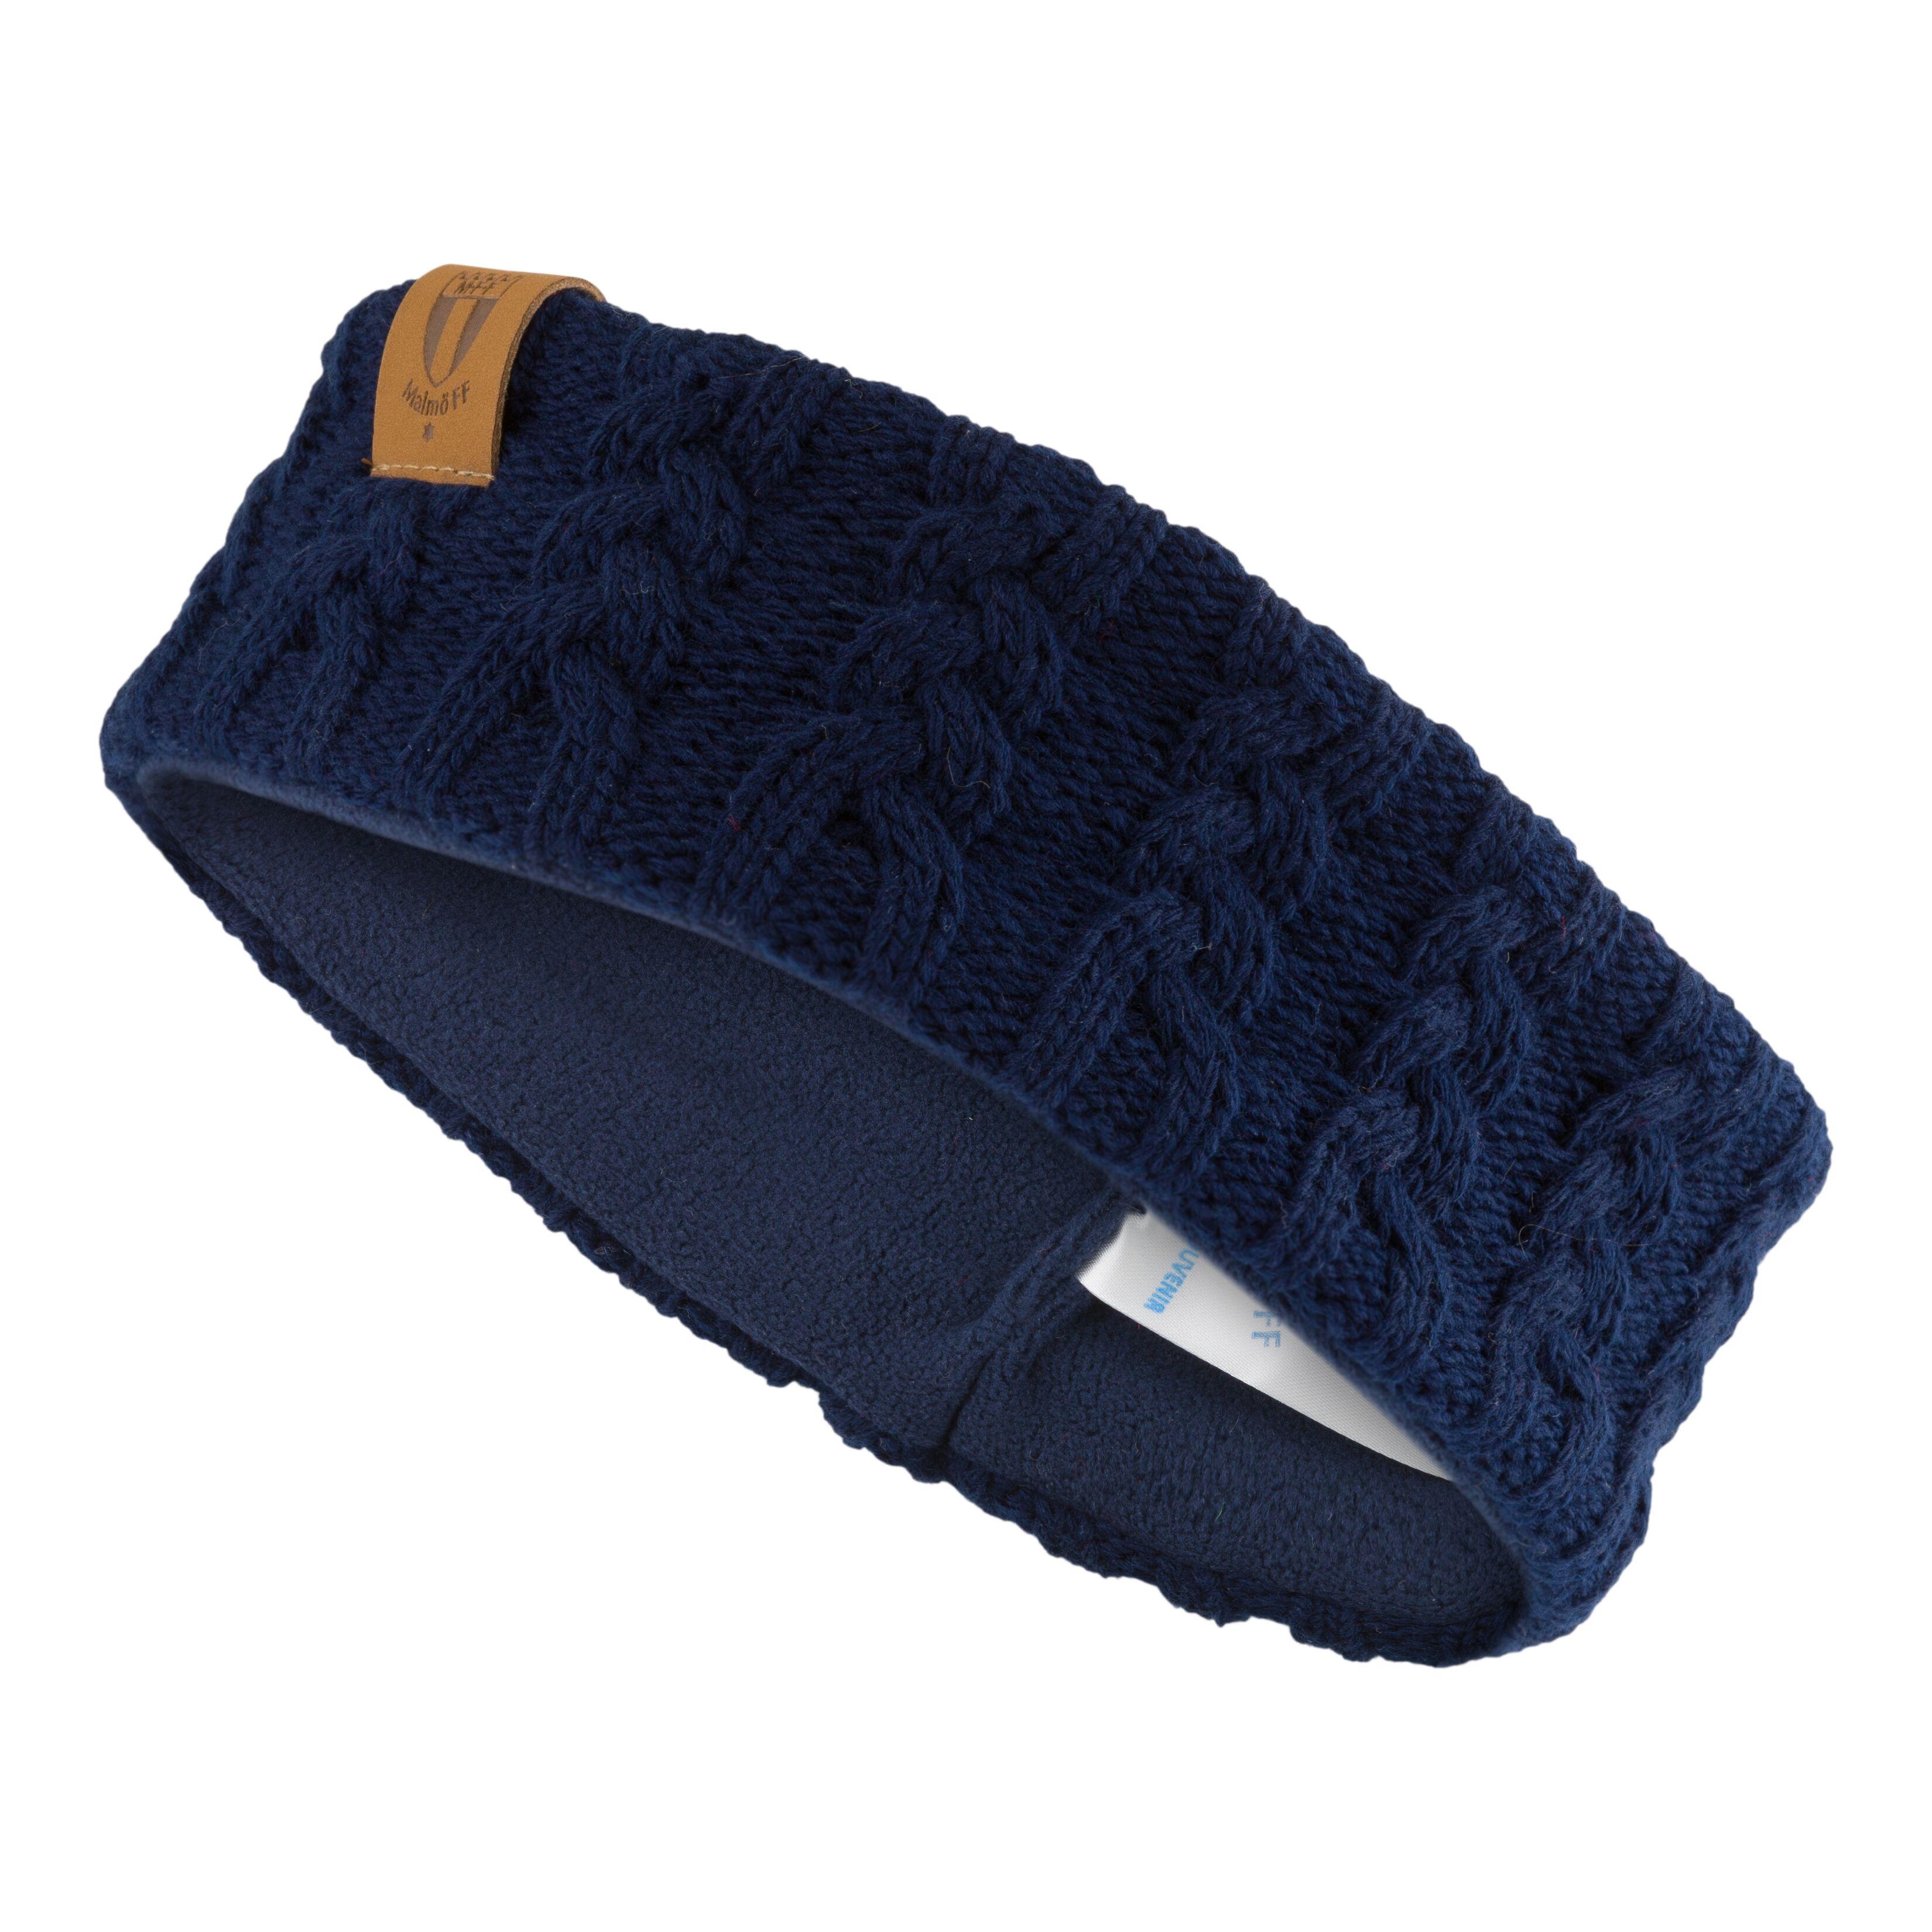 Pannband läder